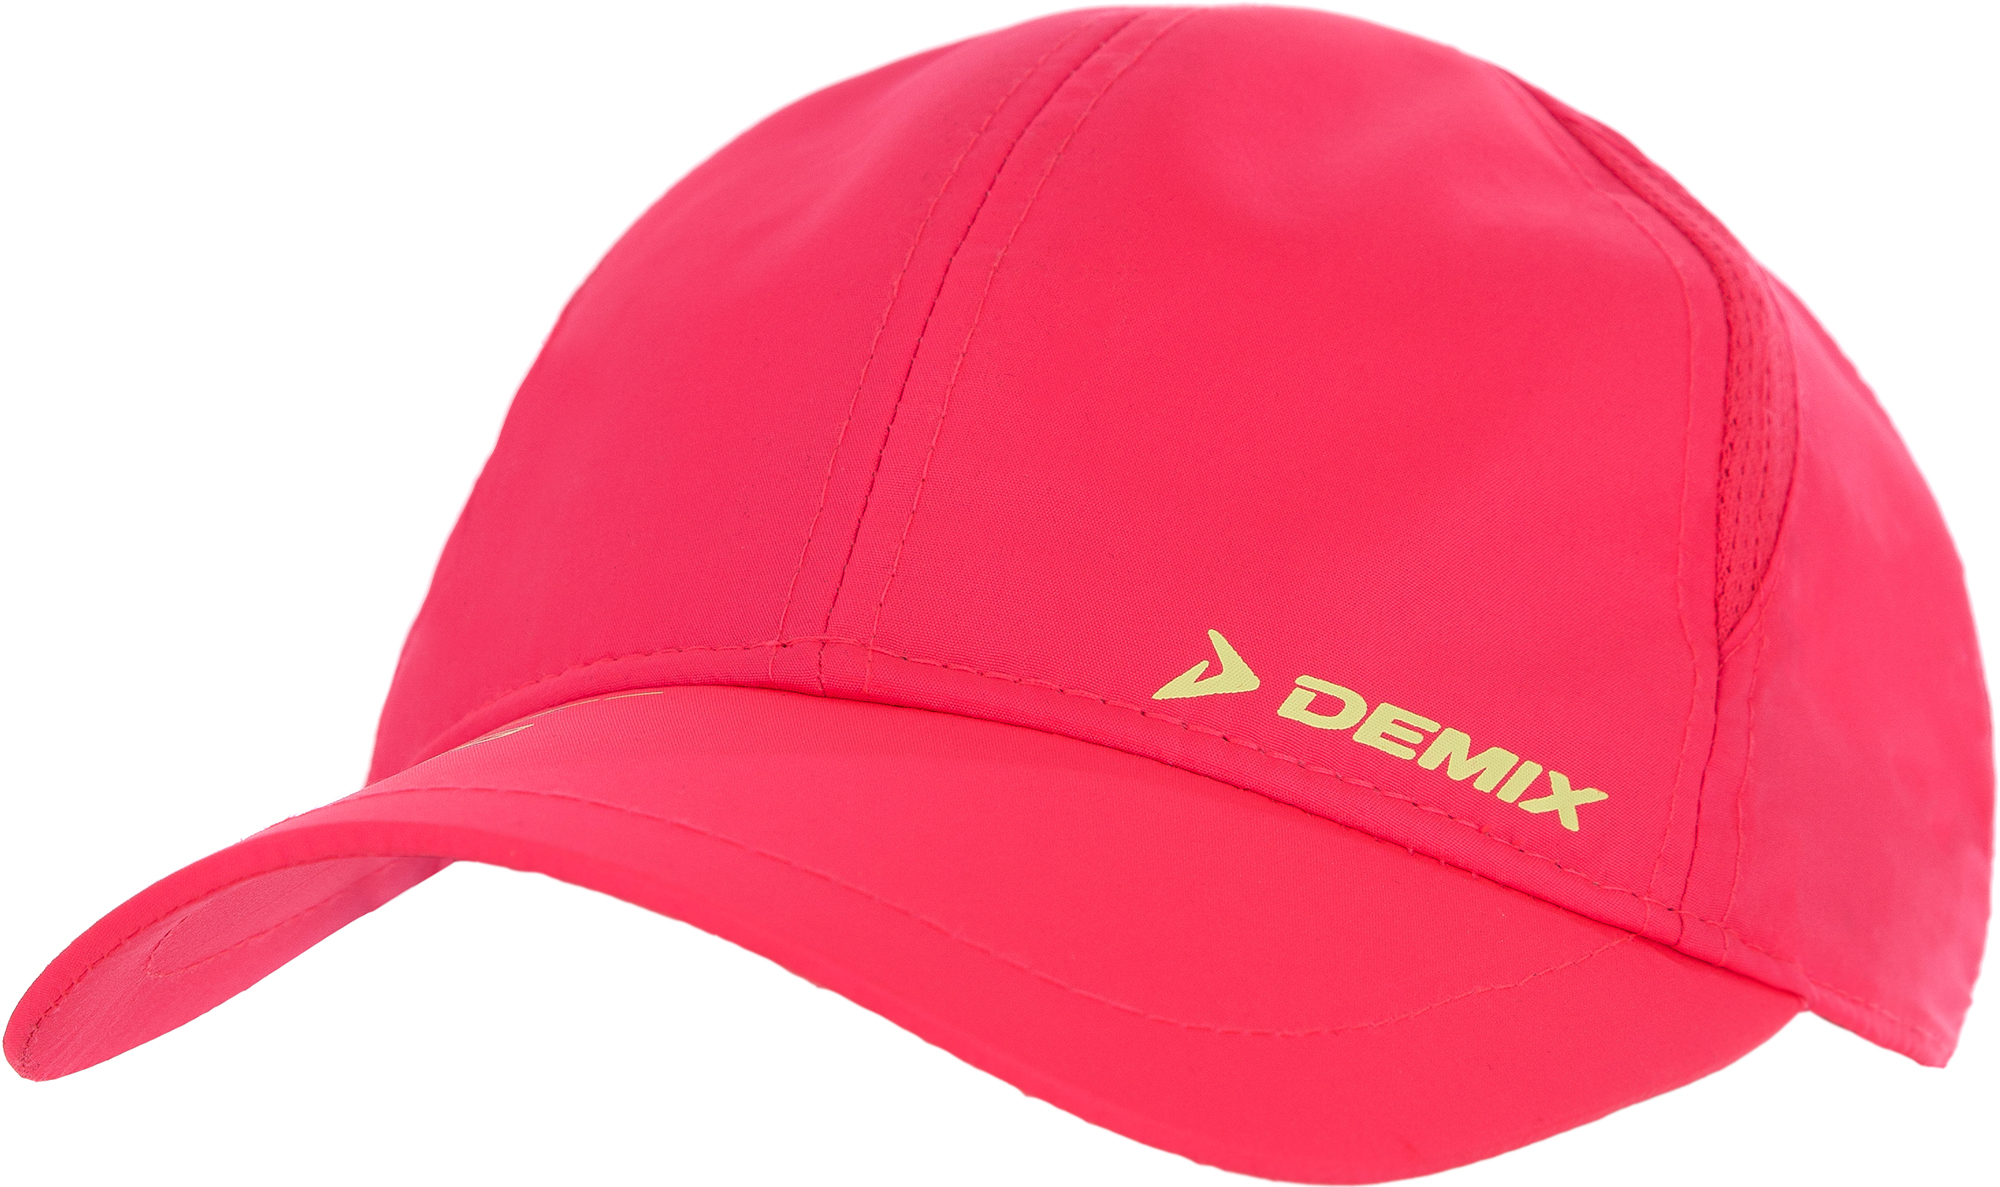 Demix Бейсболка для девочек Demix, размер 54